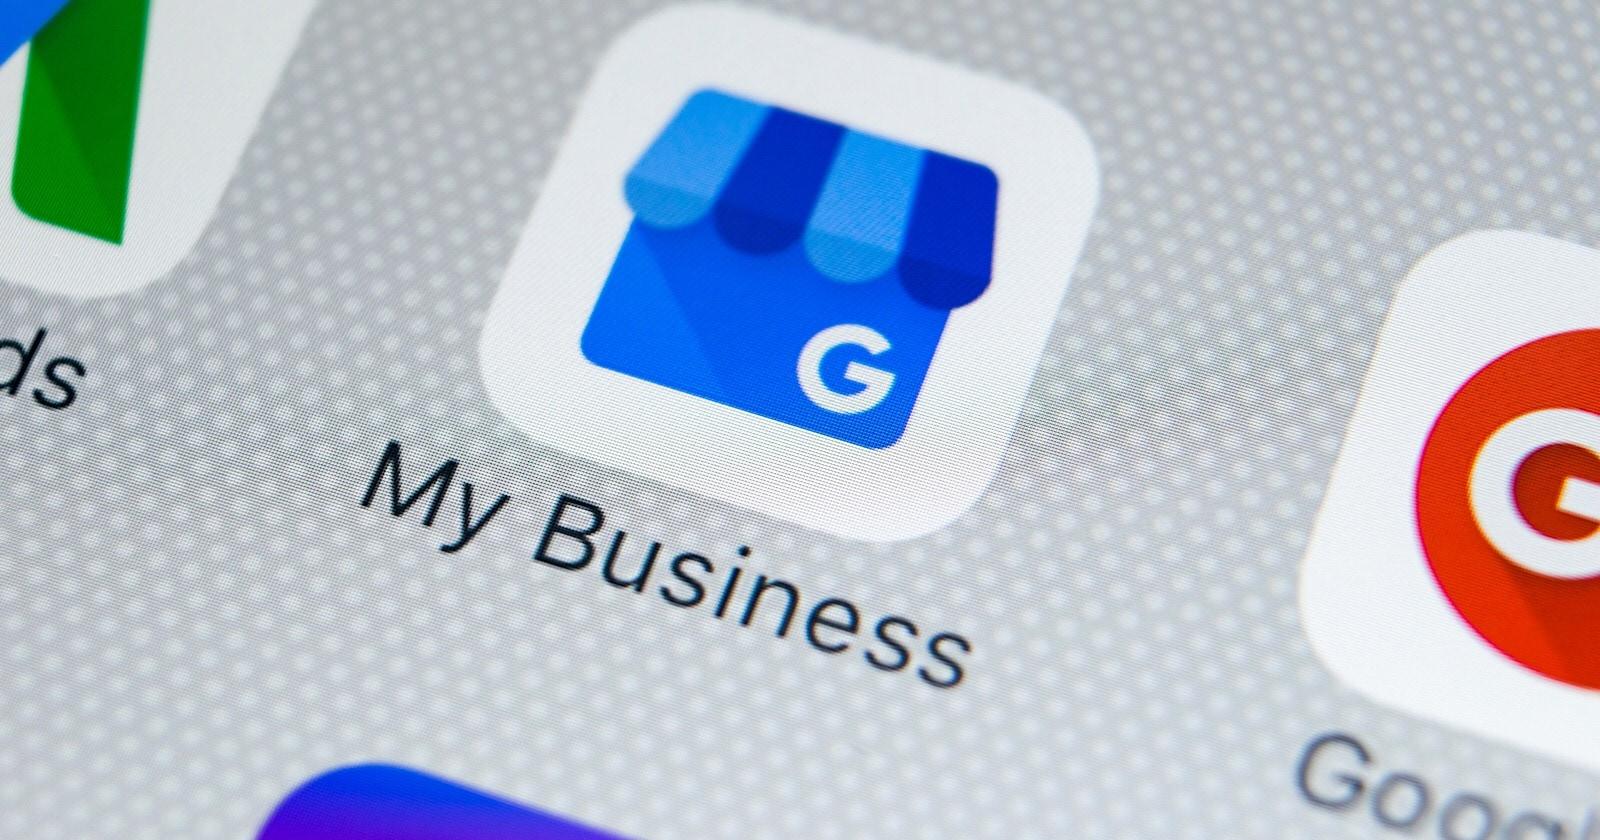 Setup, Optimize Or Verify Your Google My Business